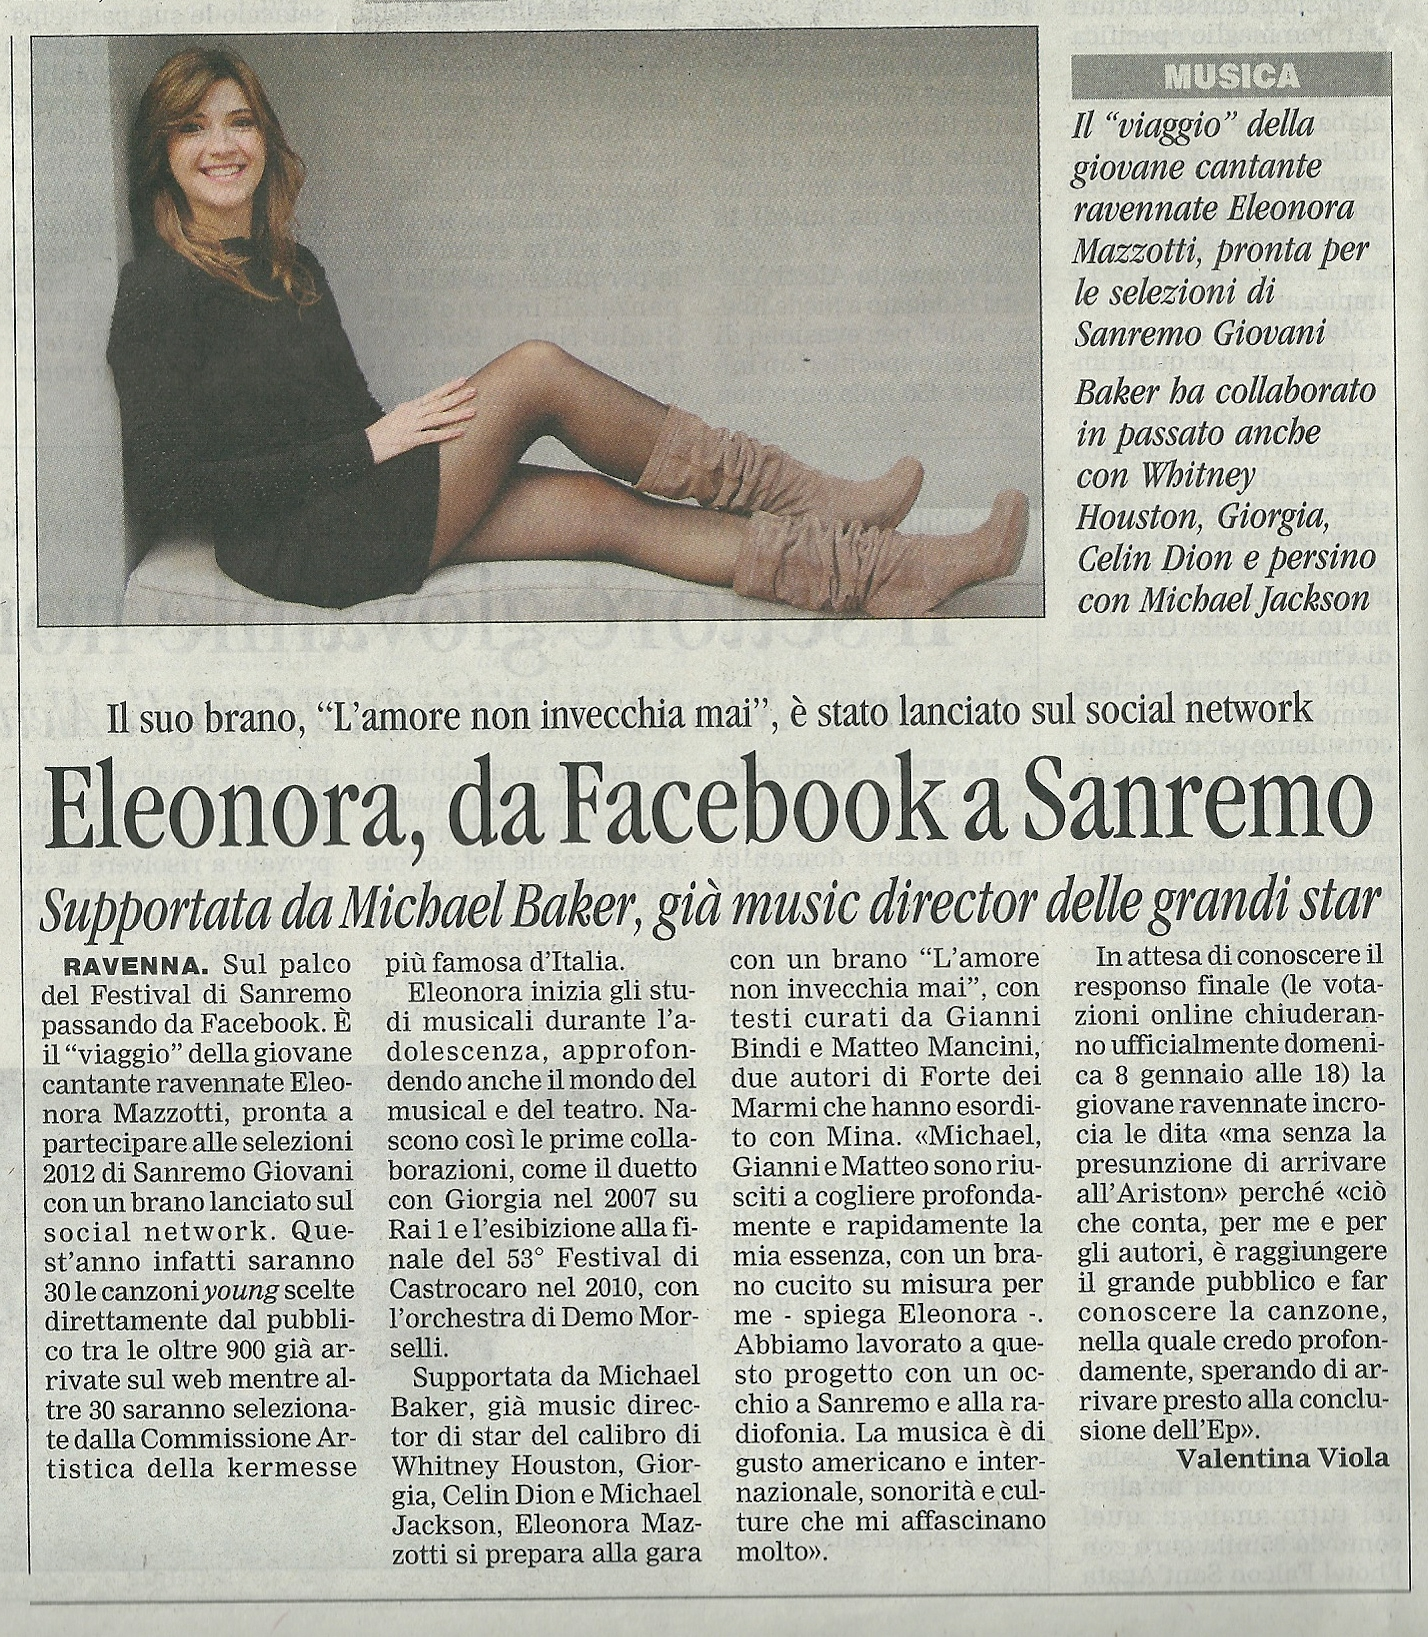 Corriere di Romagna, Ravenna, 5-1-2012